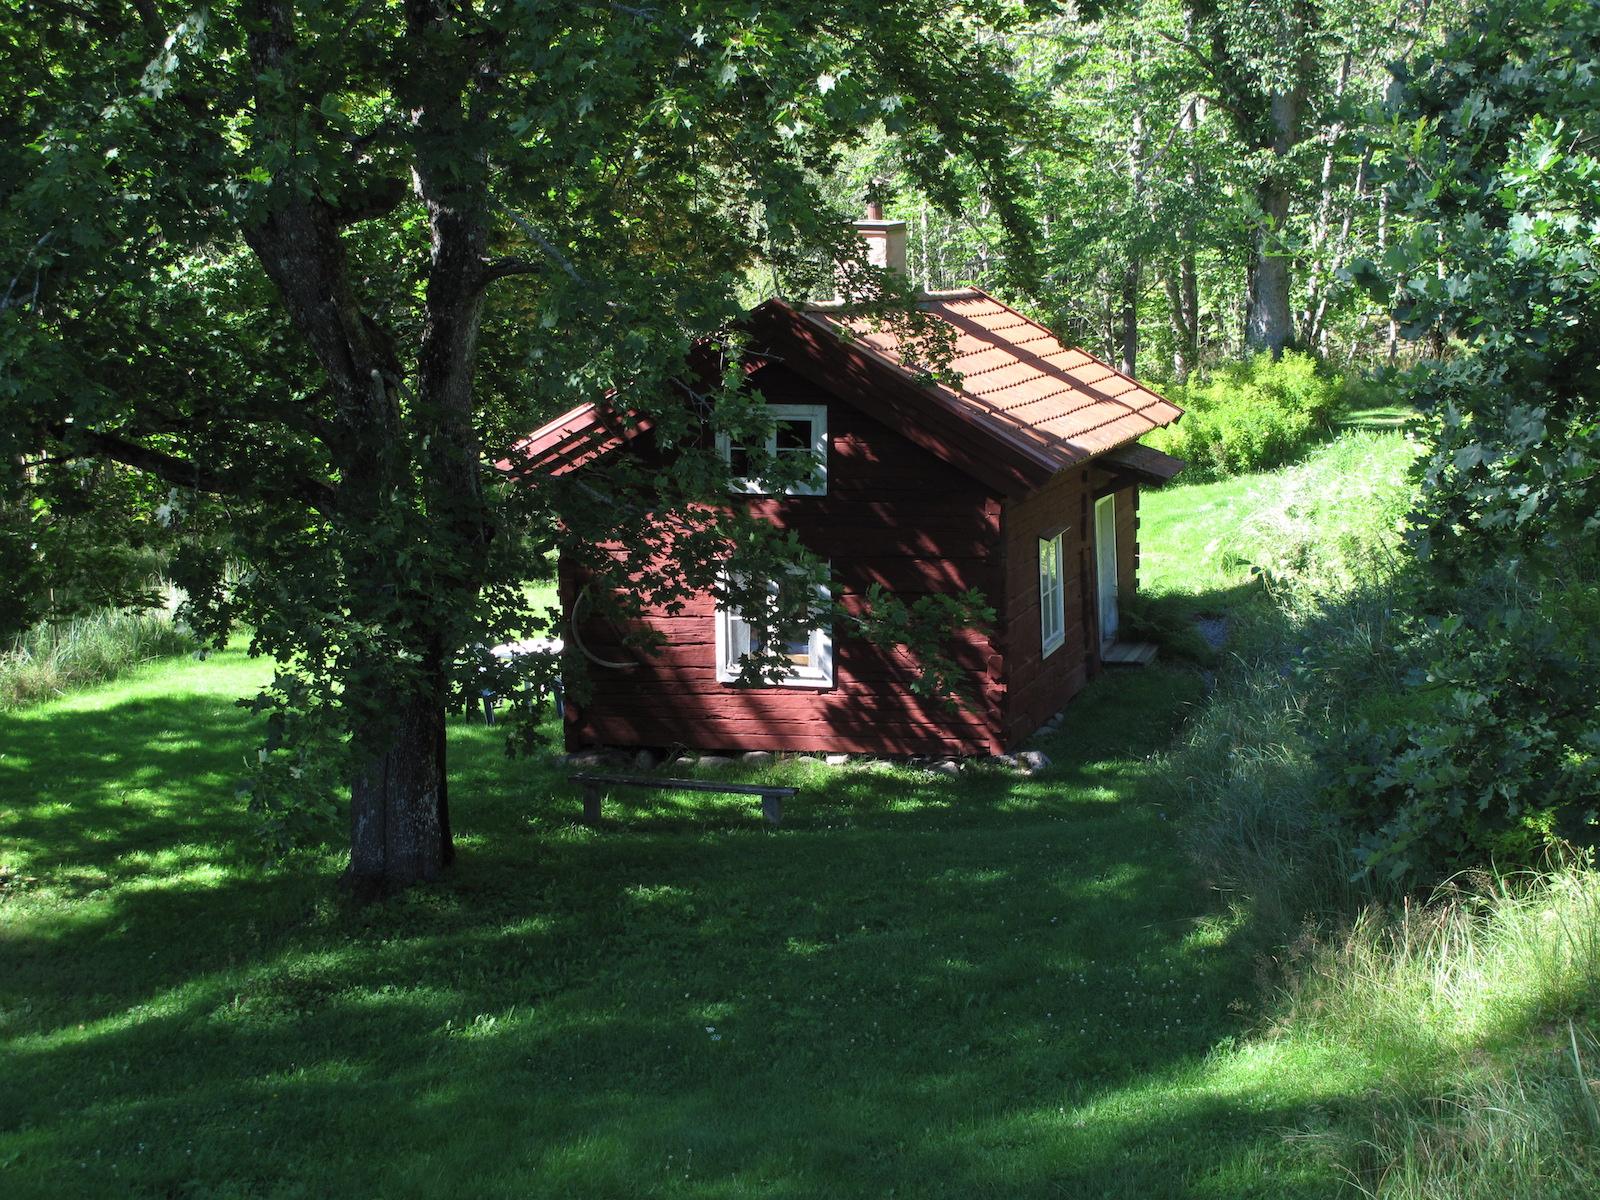 Sommarstuga, Torp - Ferienhäuser, Hütten, Kleine Fiskarp, Östergötland